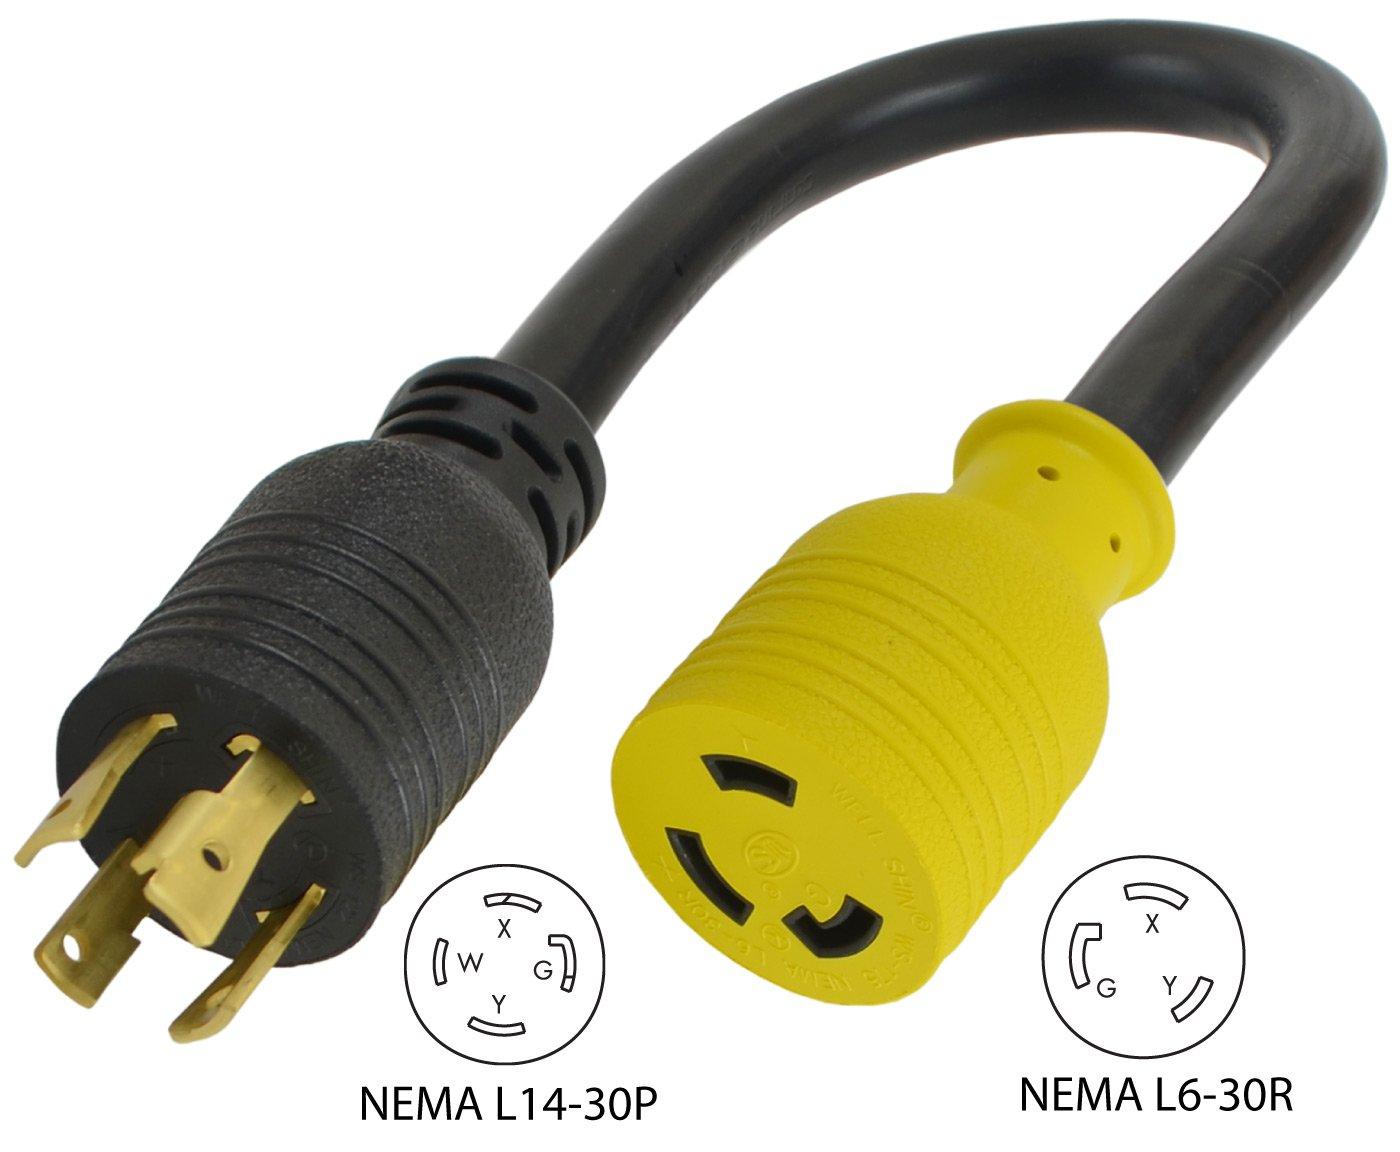 Conntek PL1430L630 Generator Adapter 30-Amp 125/250-volt L14-30 4-Prong Locking Plug to 30-Amp 250-volt L6-30R Female by Conntek (Image #2)